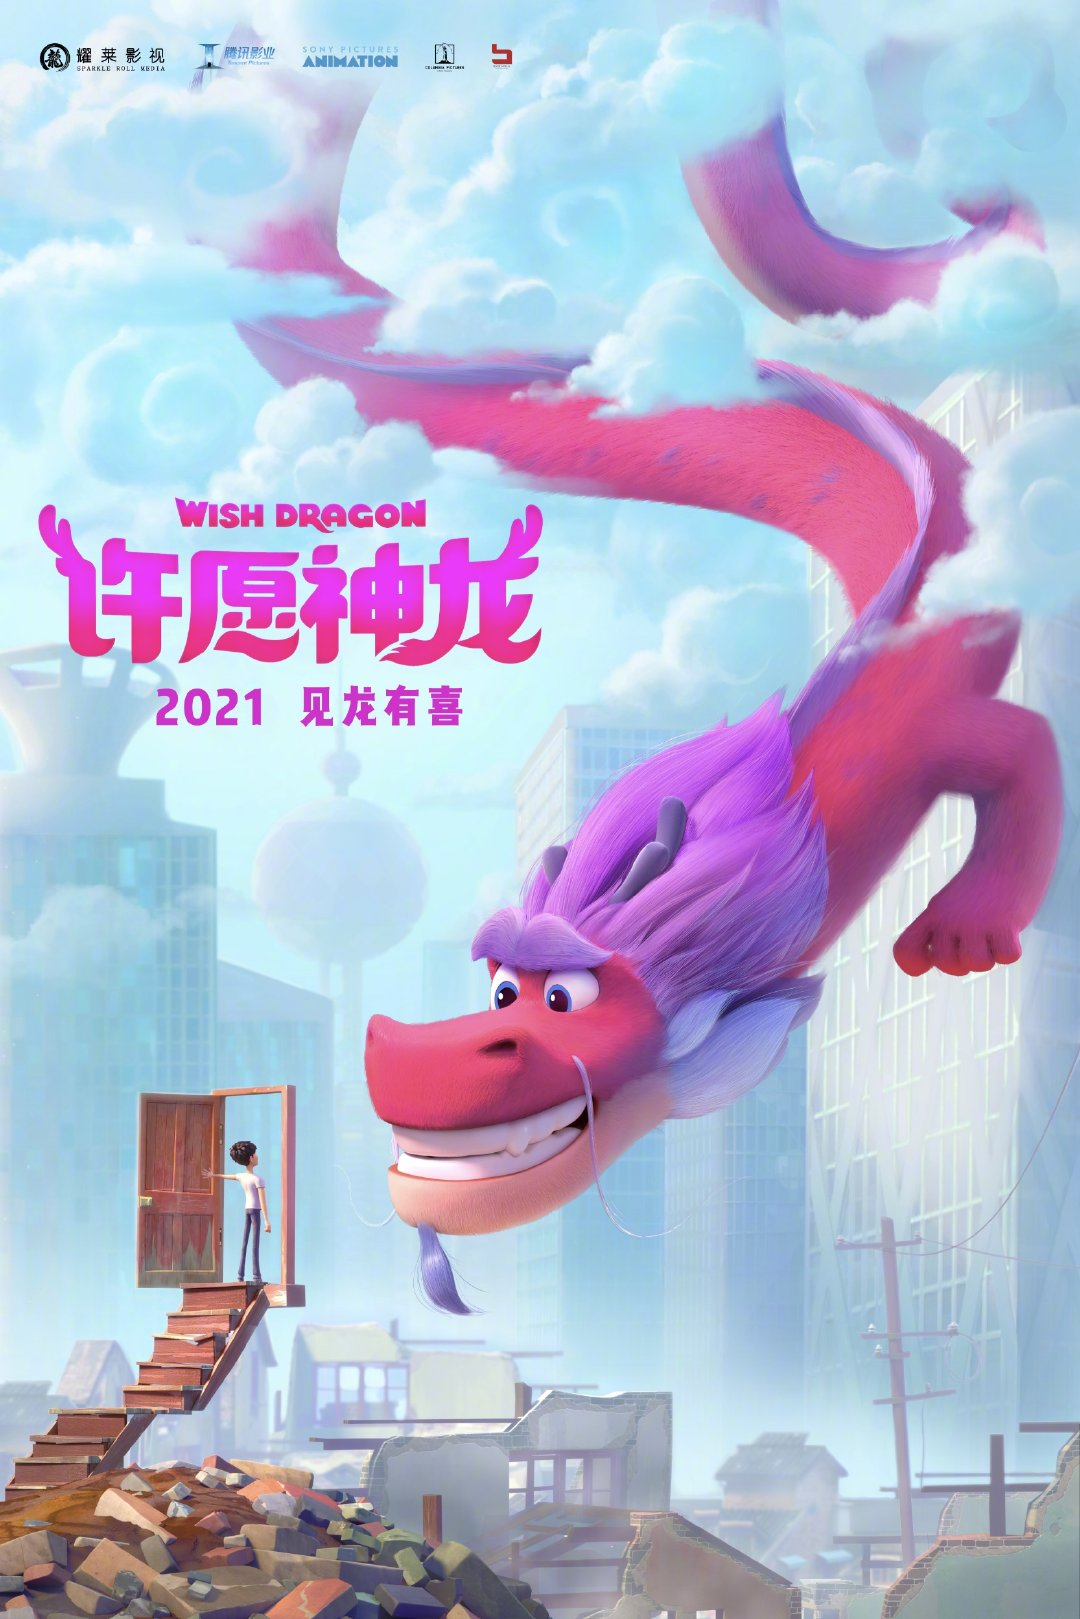 Download Filme Wish Dragon Torrent 2021 Qualidade Hd